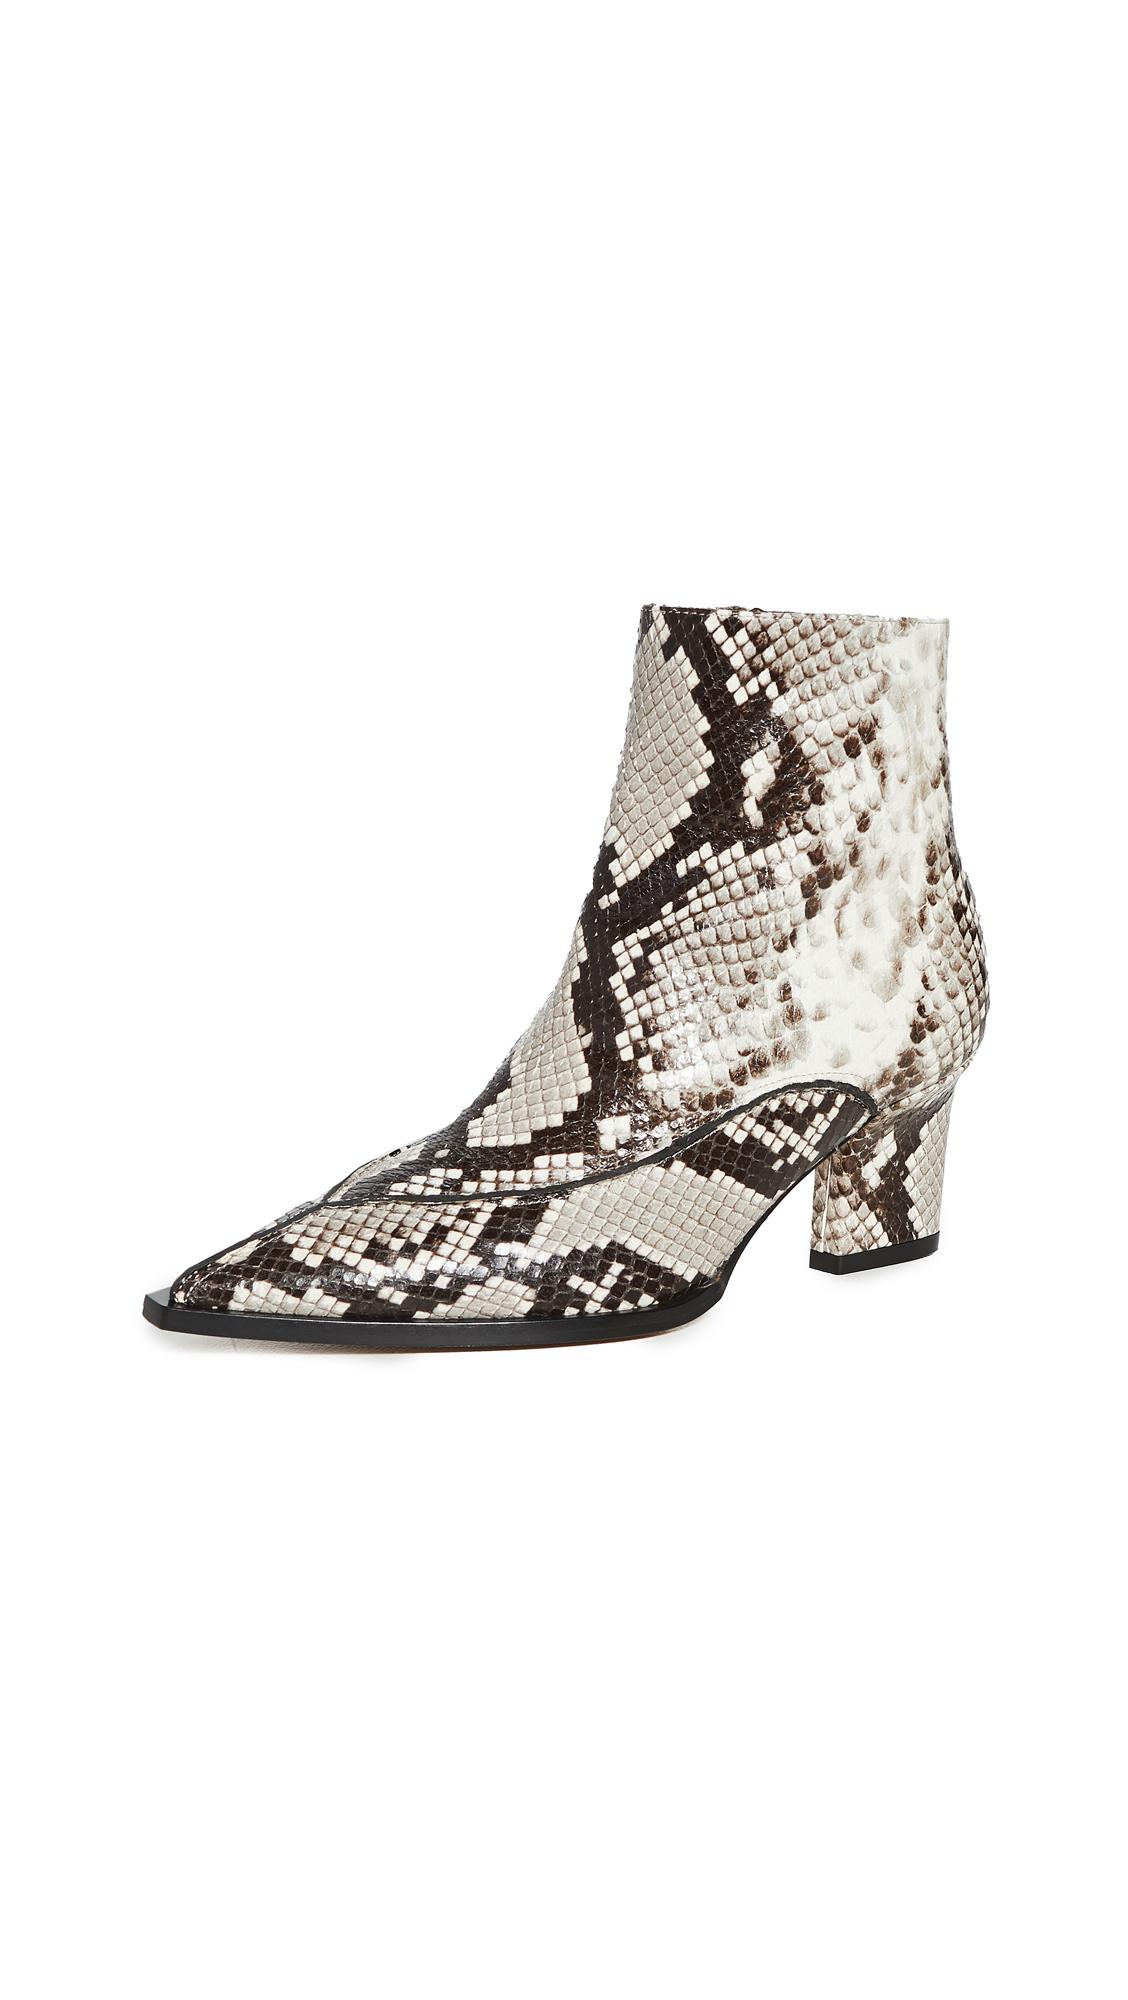 Rachel Comey Mimmo Boots